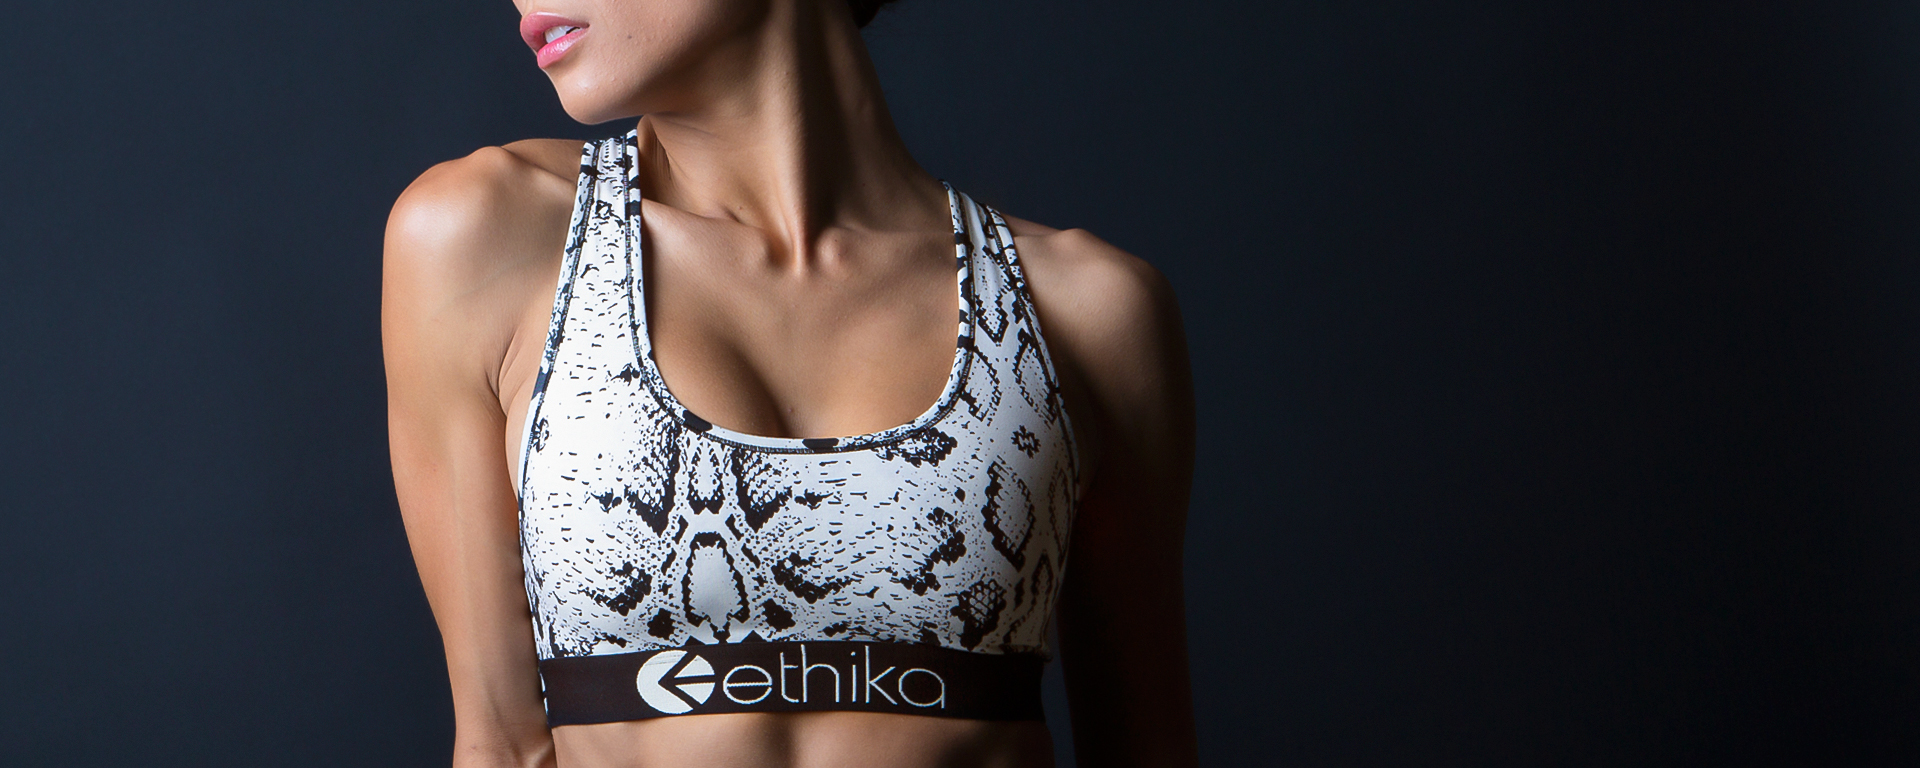 Ethika Life Ethika - With You Everywhere-9443